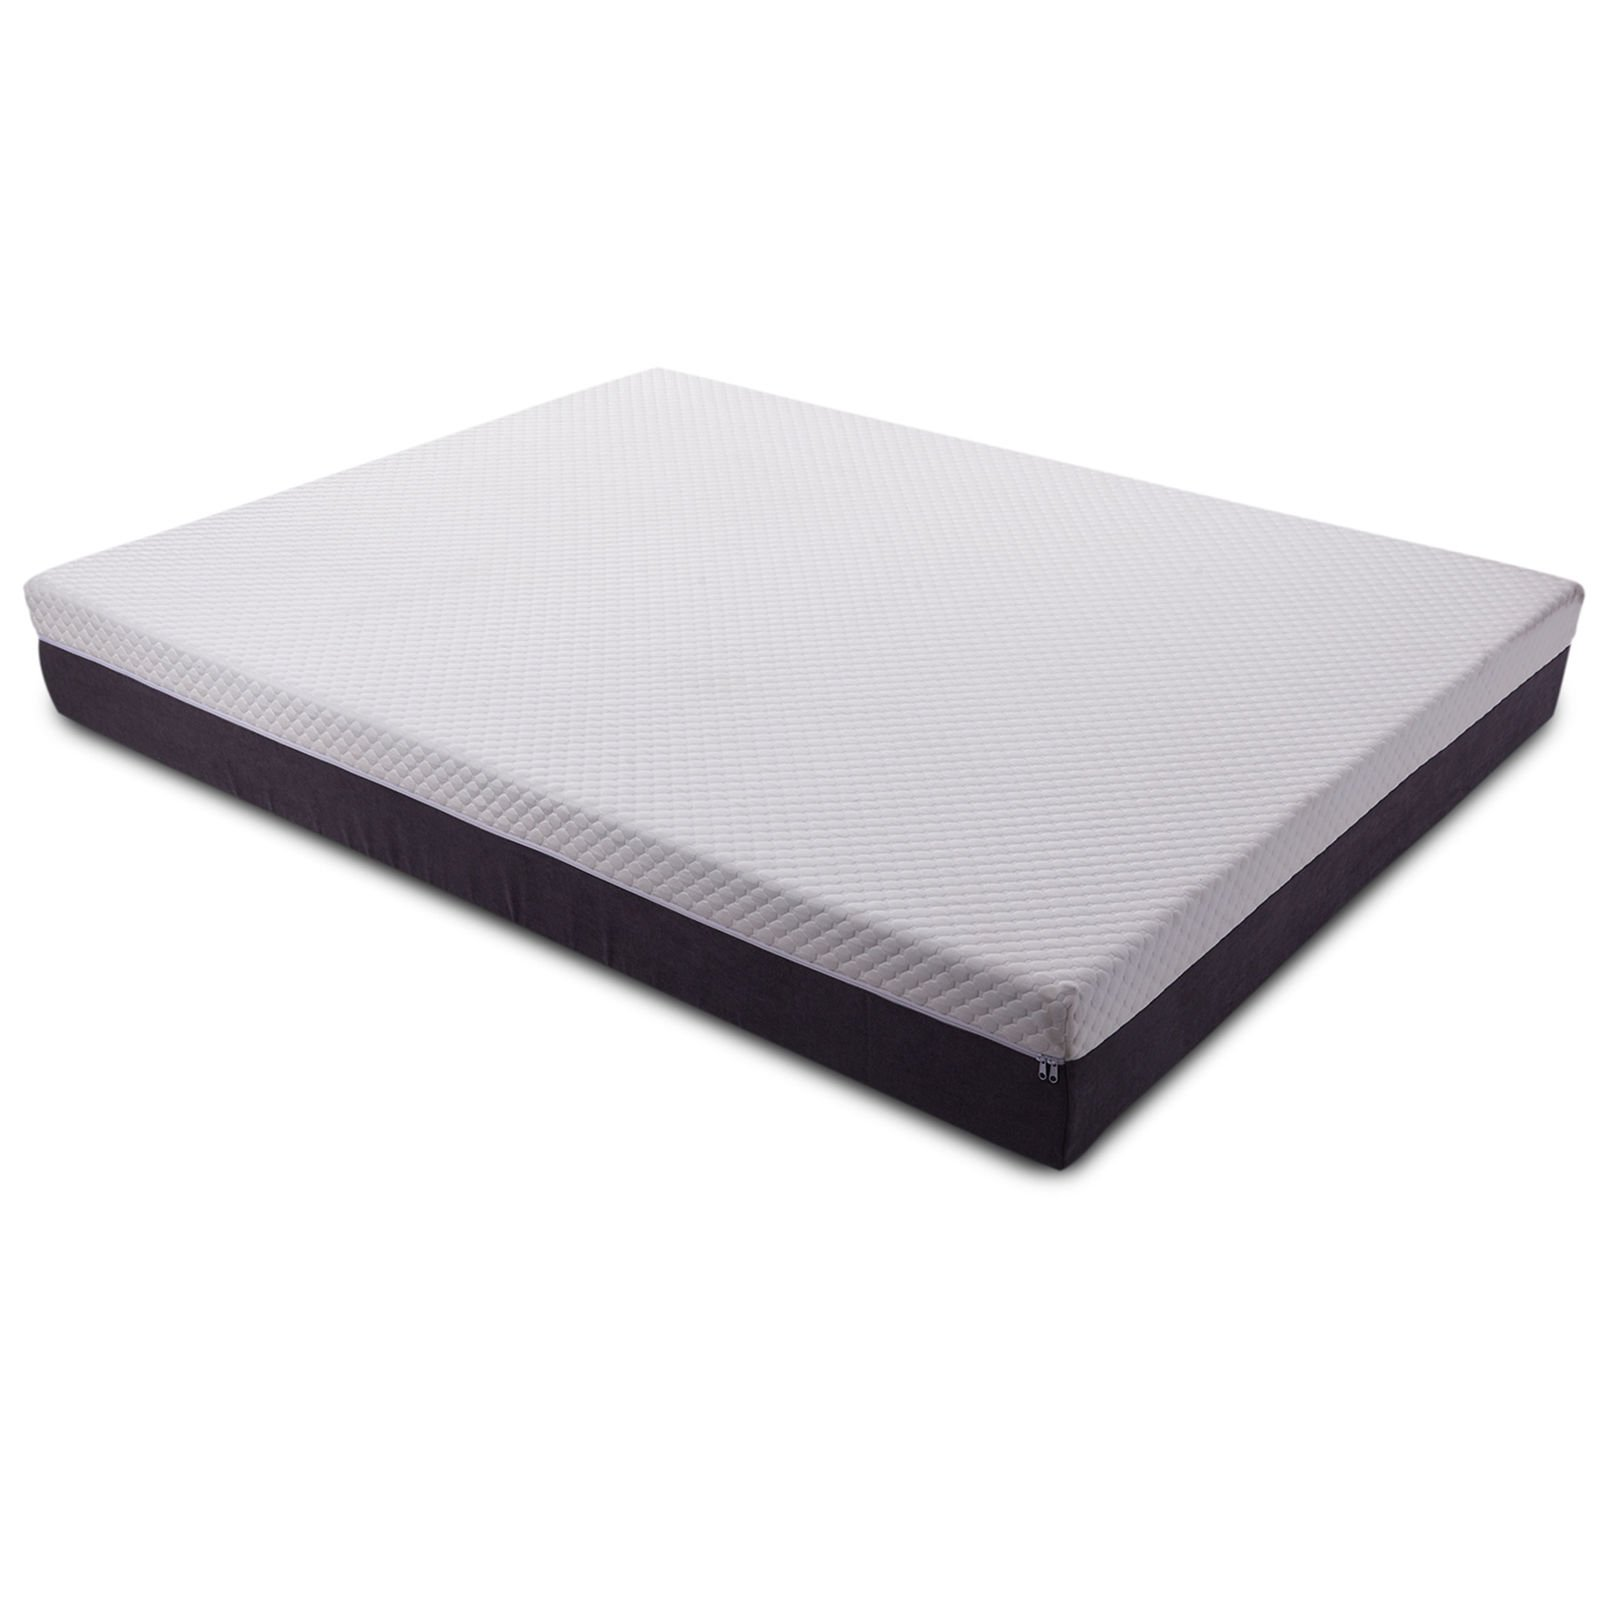 "Hot Memory Foam Mattress 10"" Washable King Size"